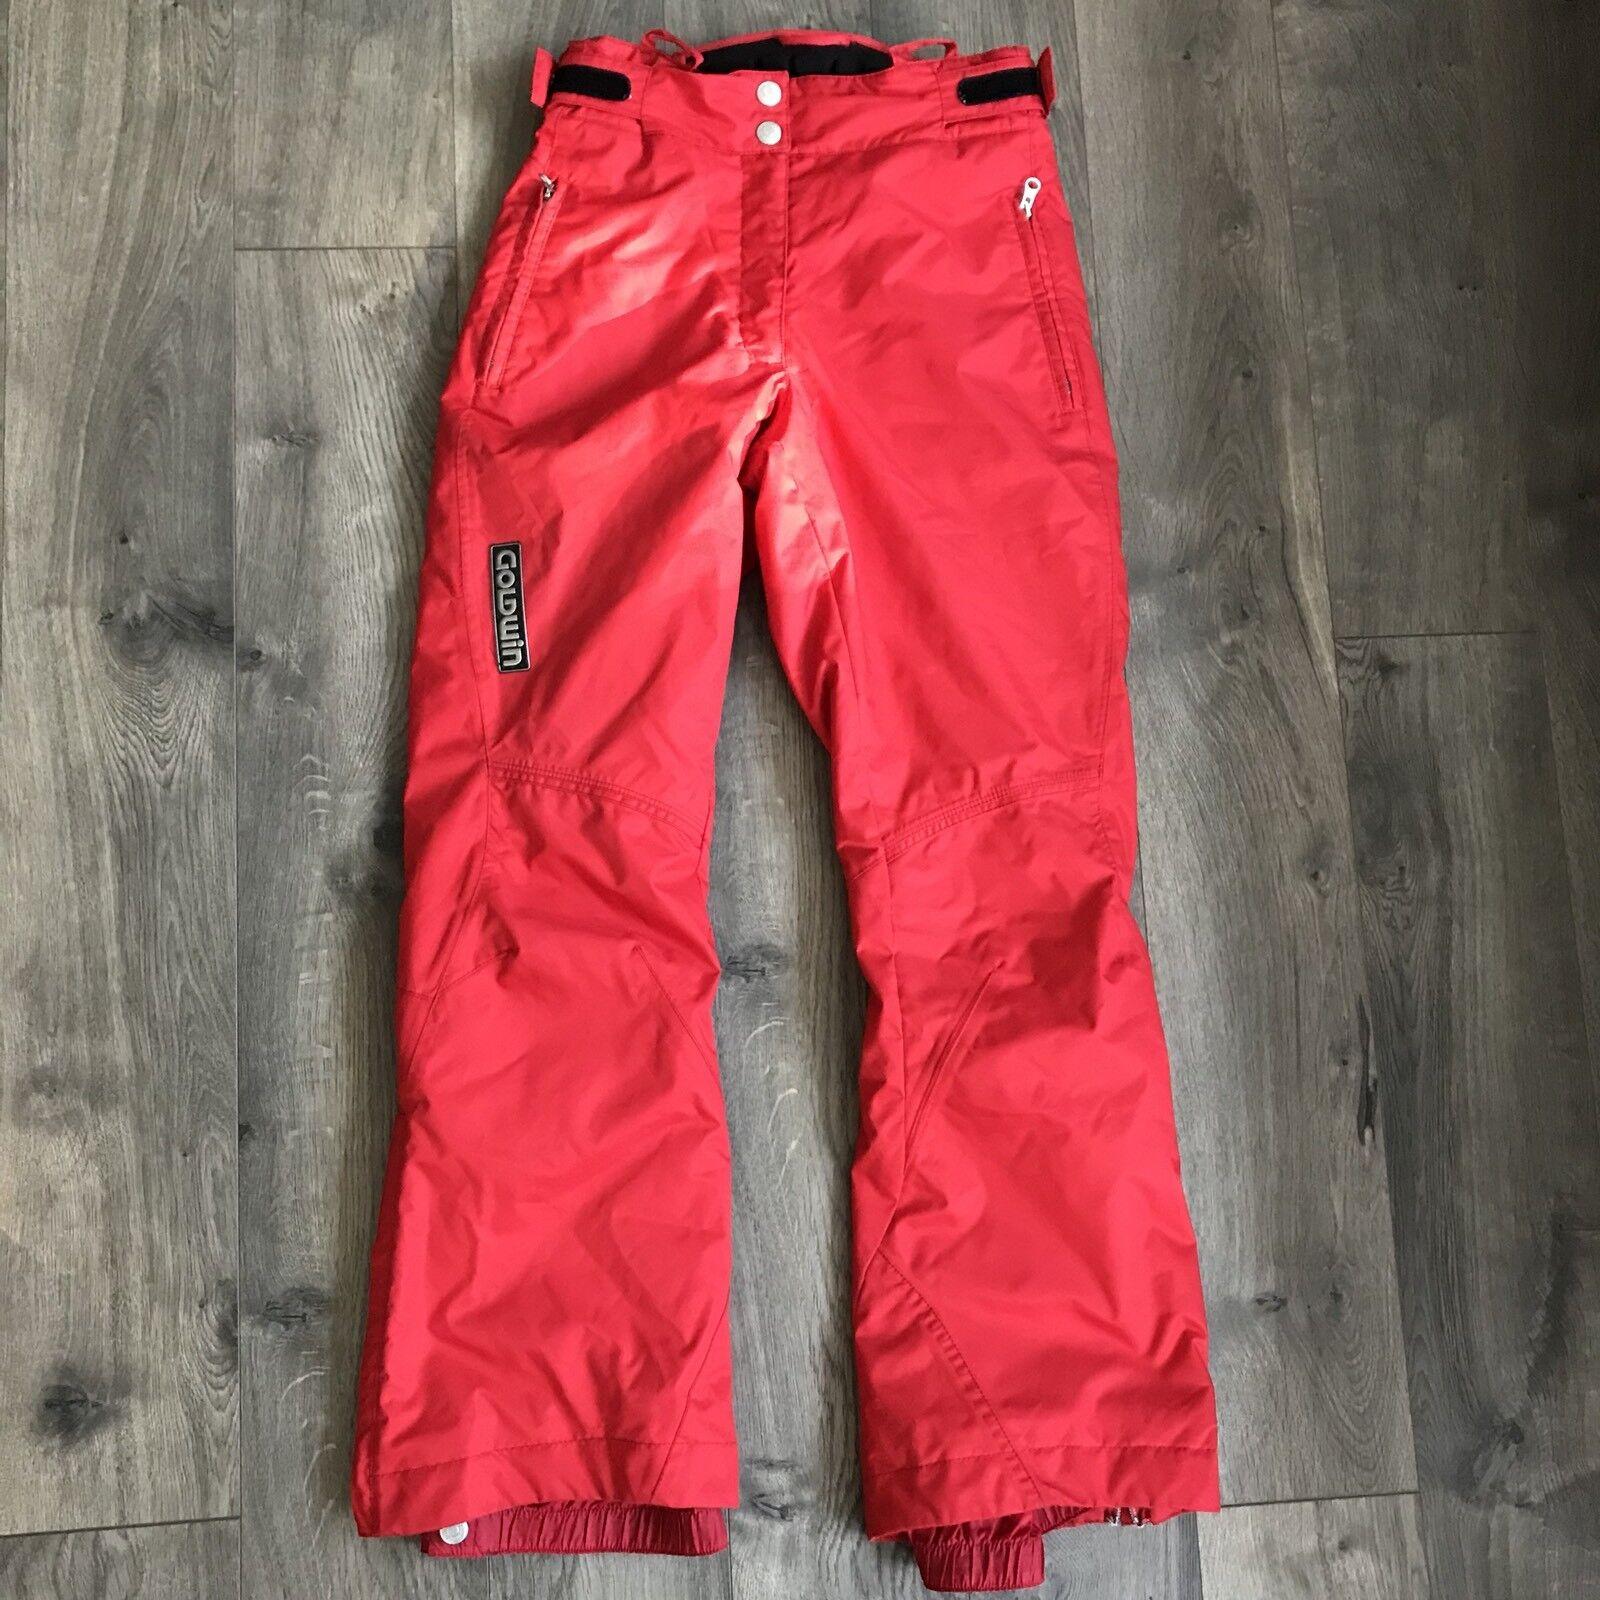 GoldWIN G-8352EL SKI Snowboard Race Racing Pants rot Woman's Größe 10